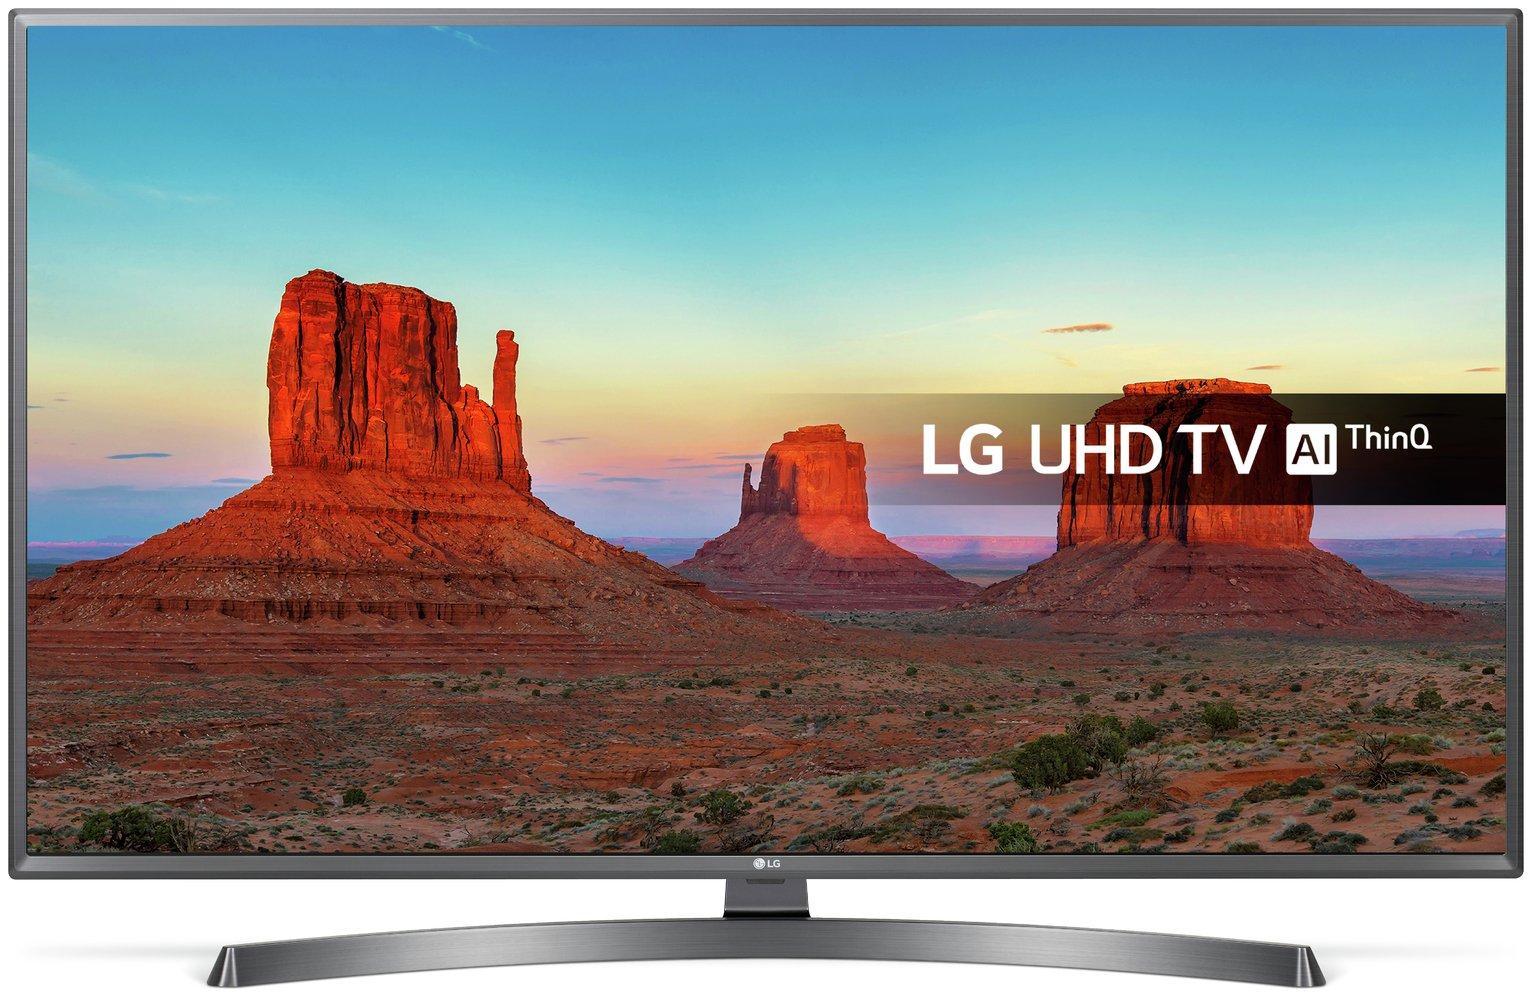 LG 43 Inch 43UK6750PLD Smart 4K HDR LED TV